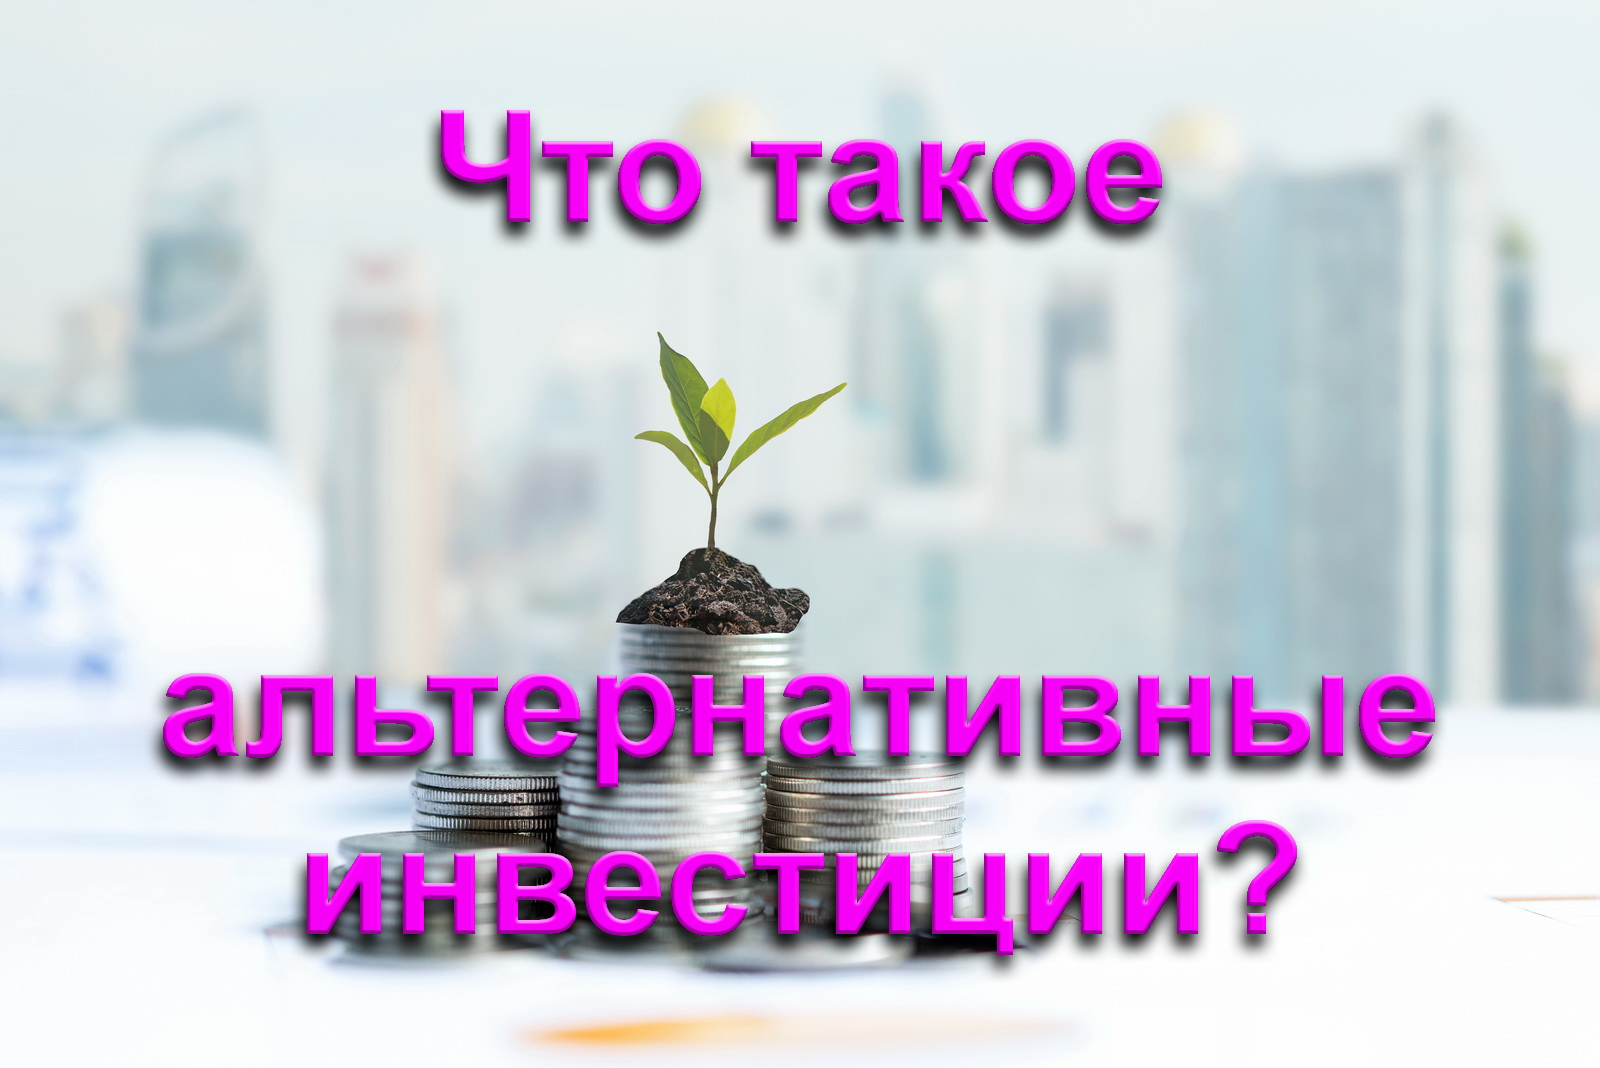 Что такое Alternative Investment?